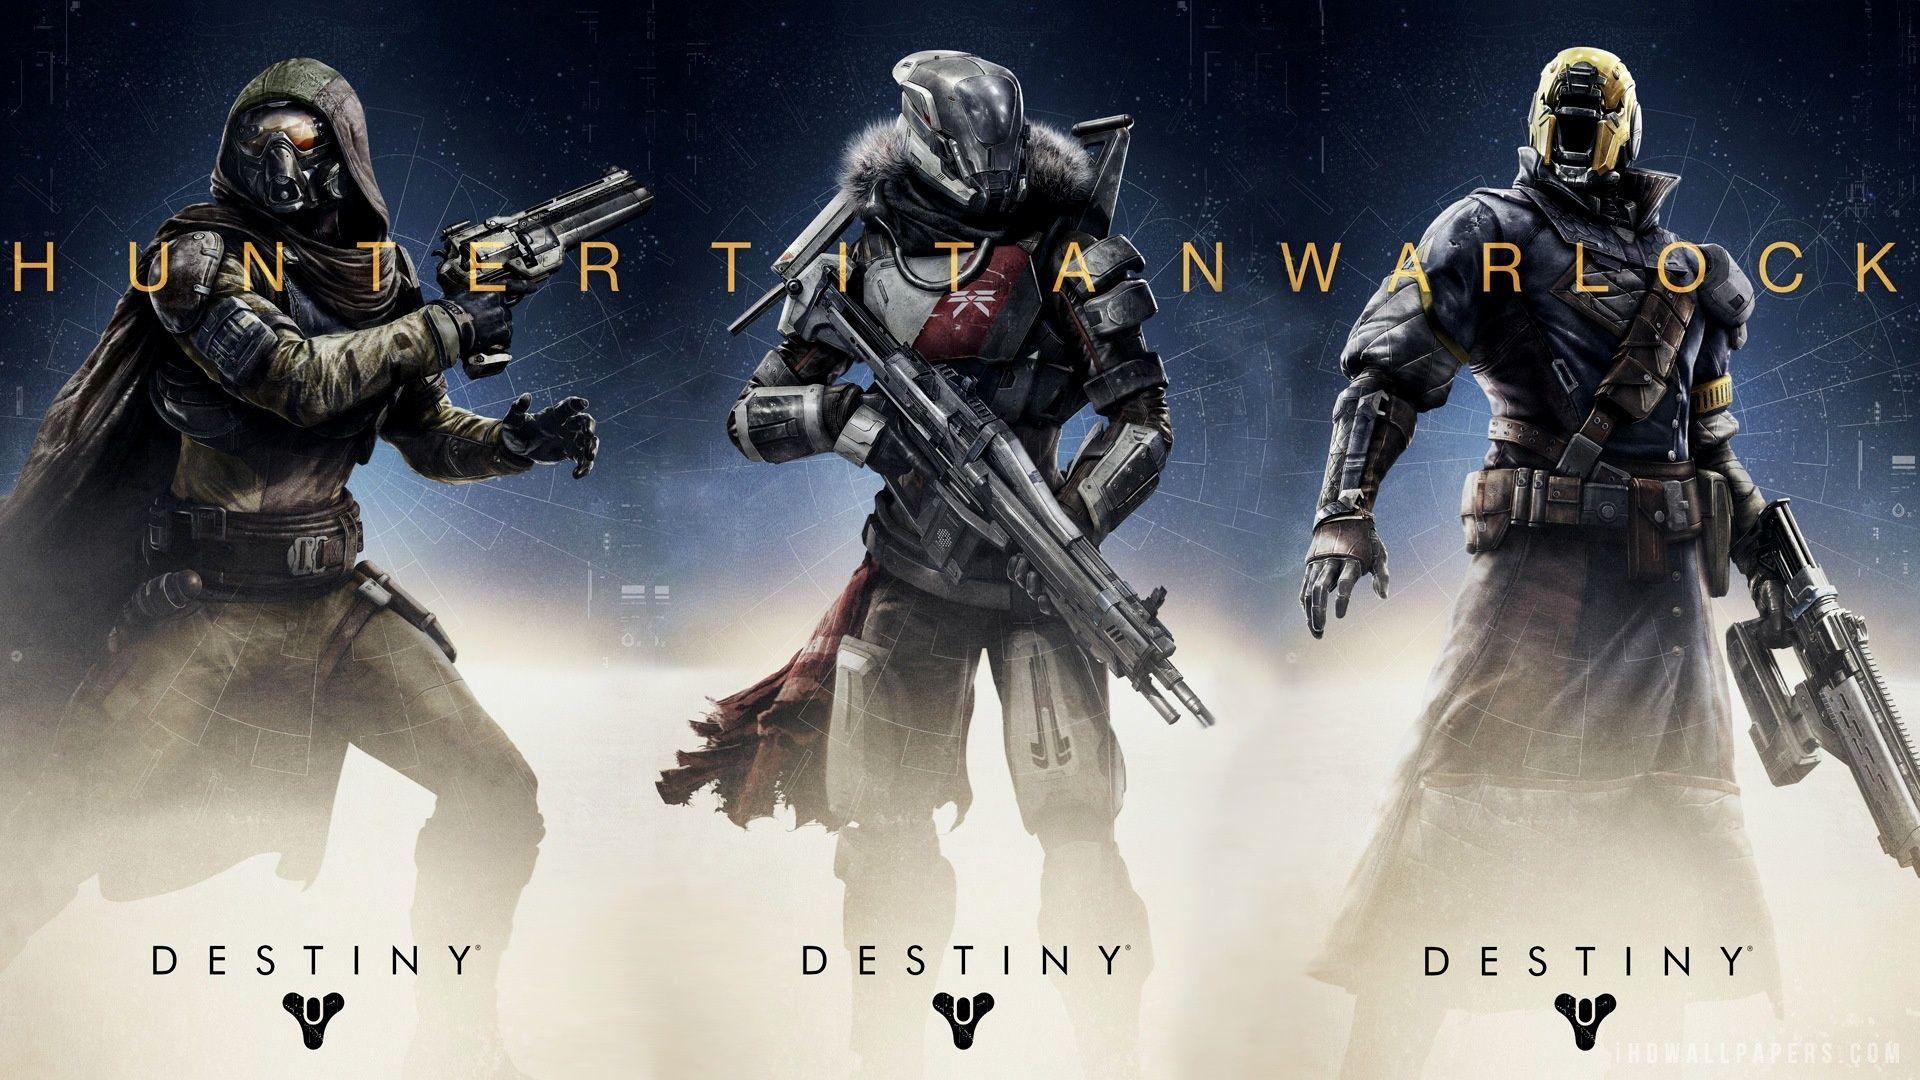 Amazing Destiny HD Wallpapers For Desktop Free